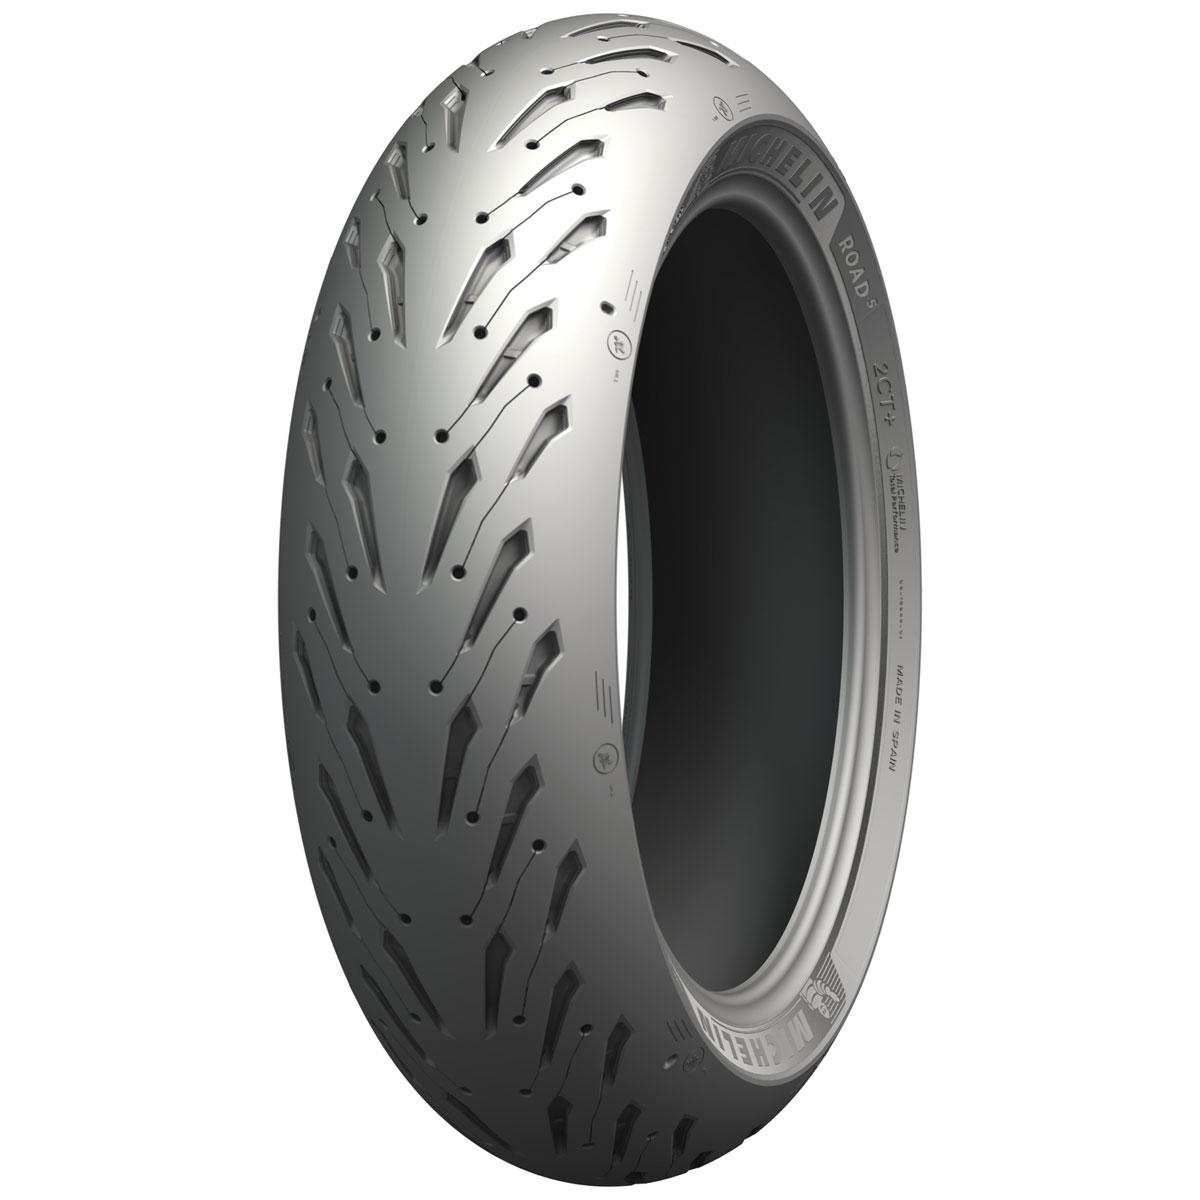 Michelin Road 5 150/70ZR17 Rear Tire